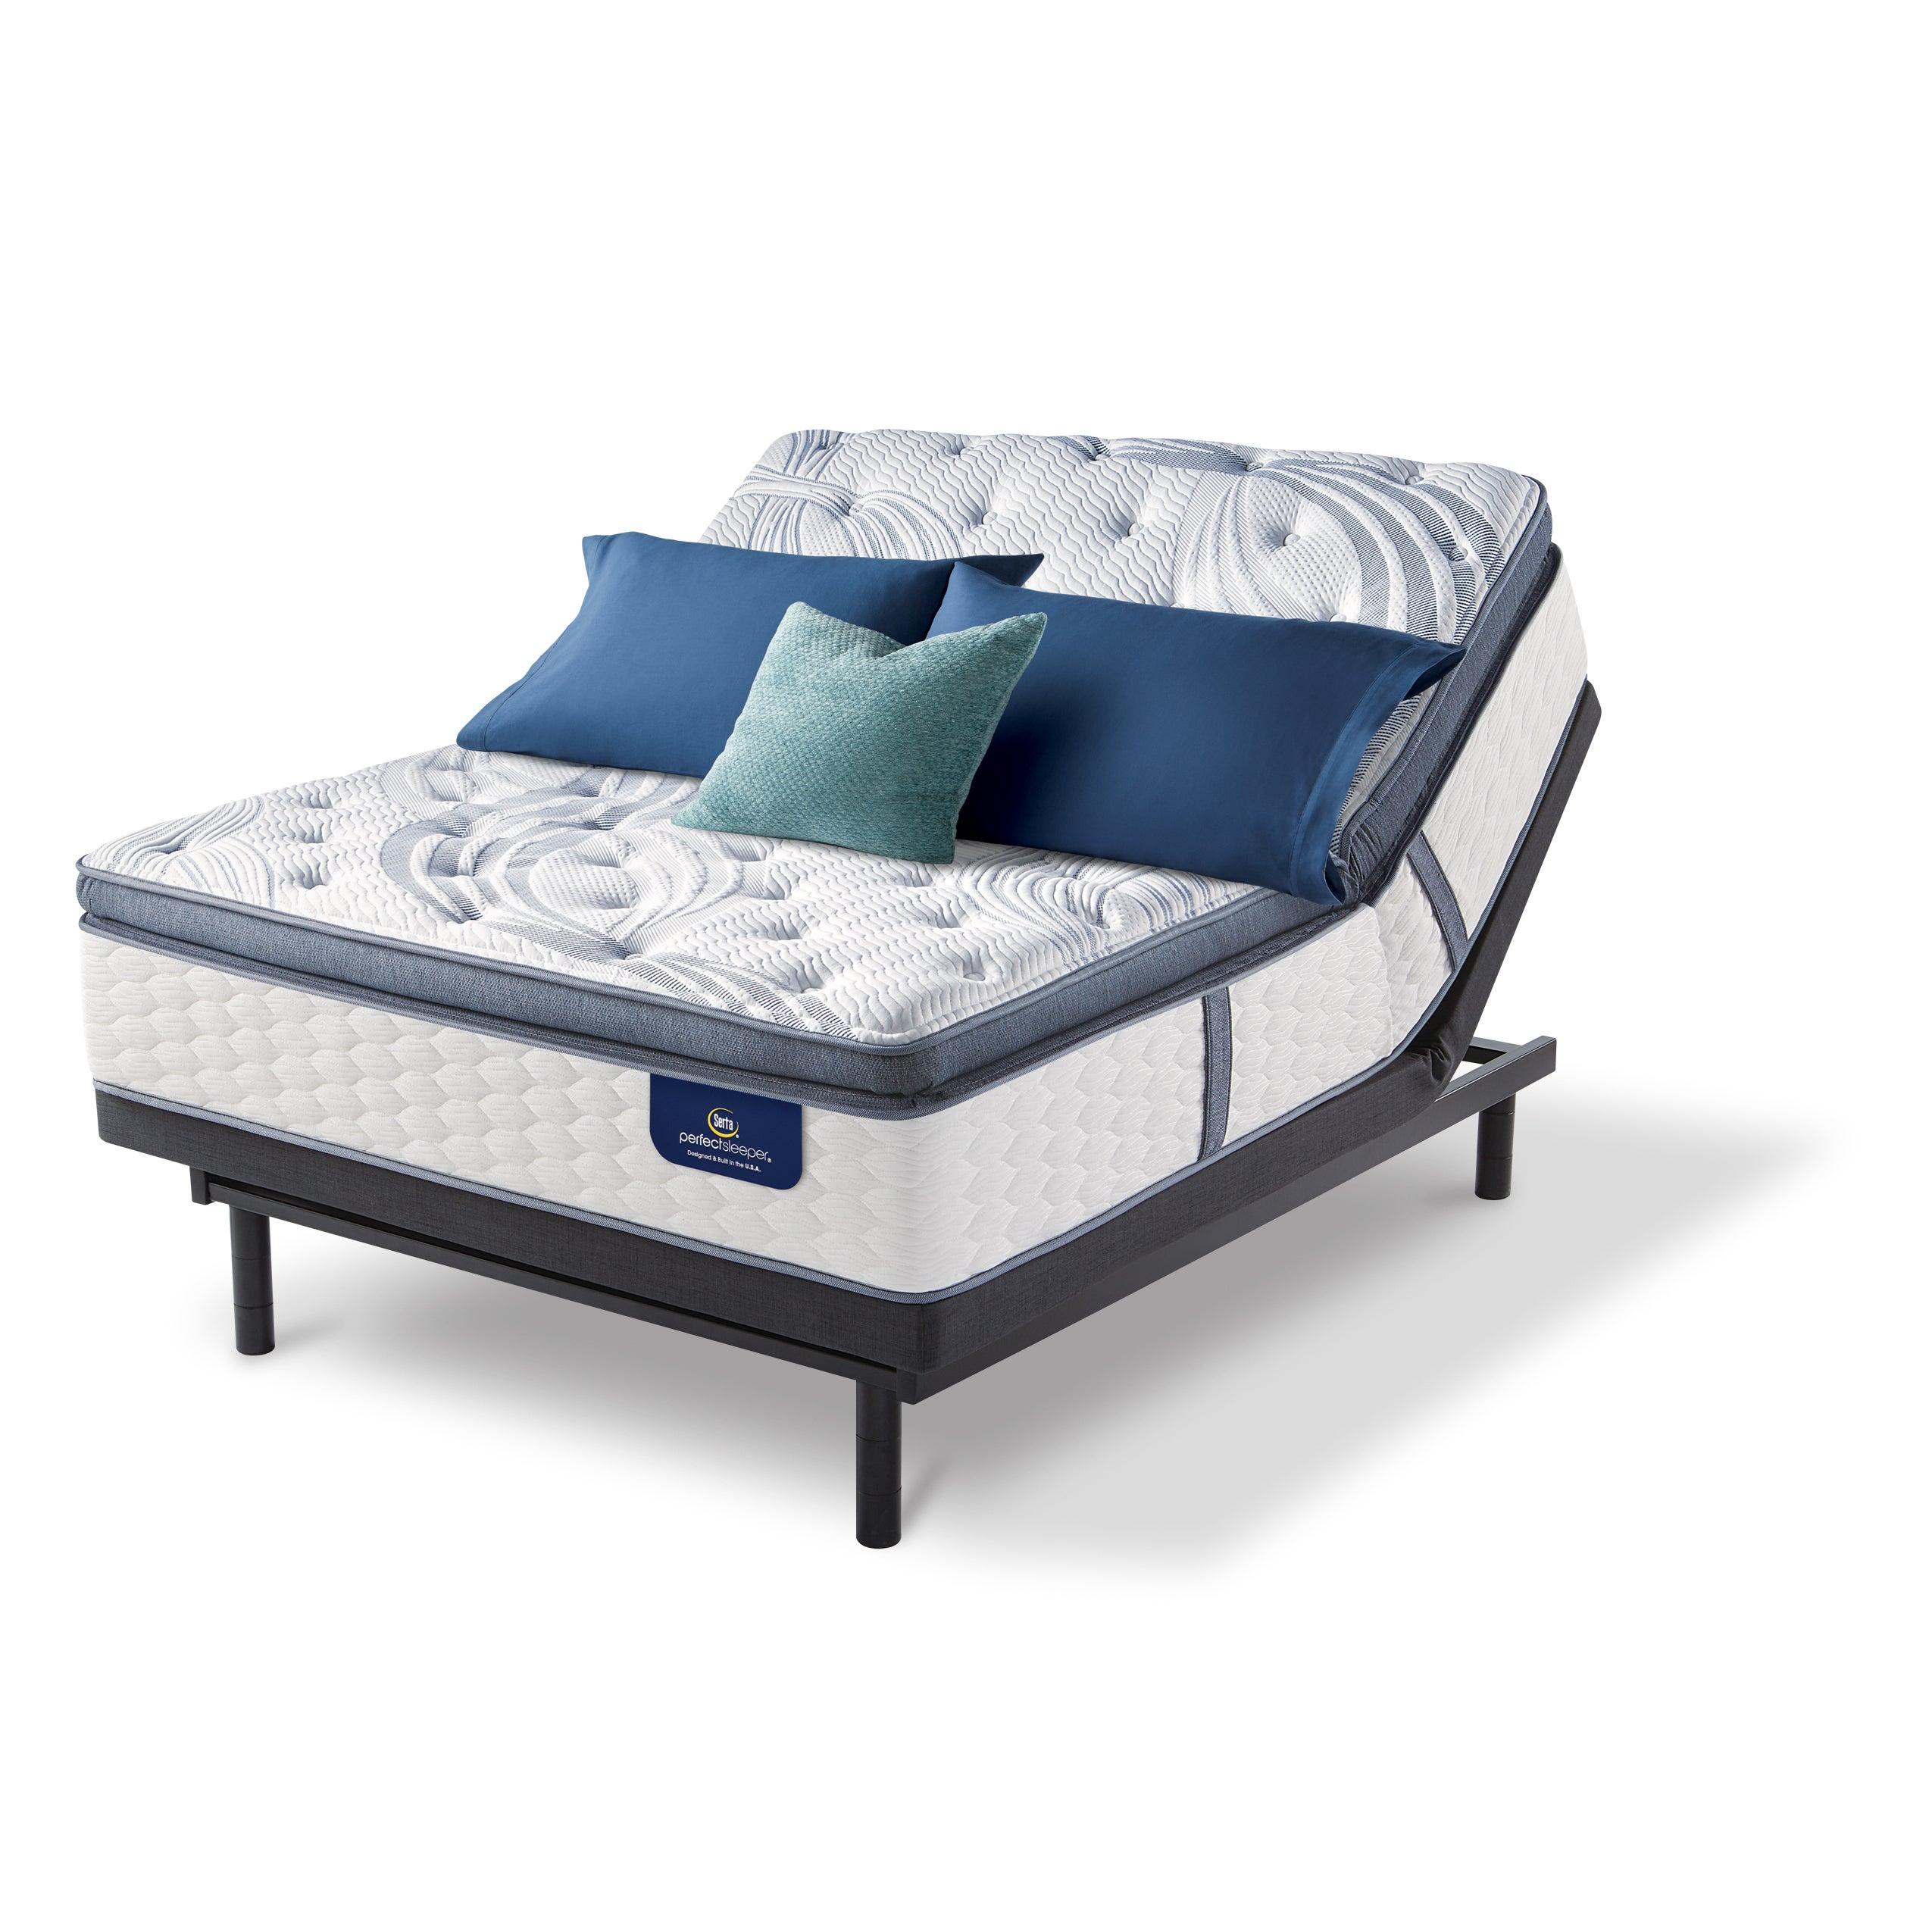 Shop Serta 13 inch Brightmore Super Pillow Top Plush Full size